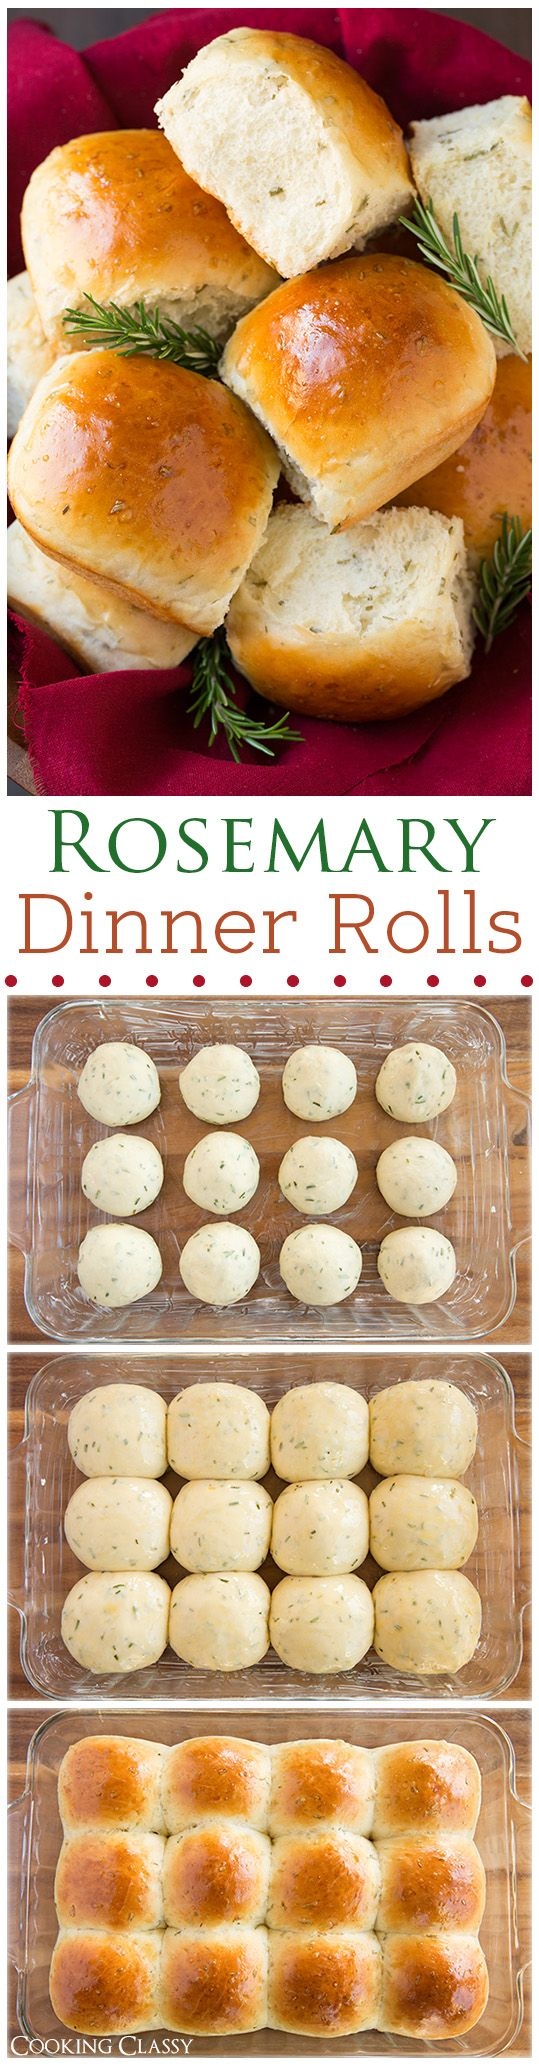 Rosemary Dinner Rolls.